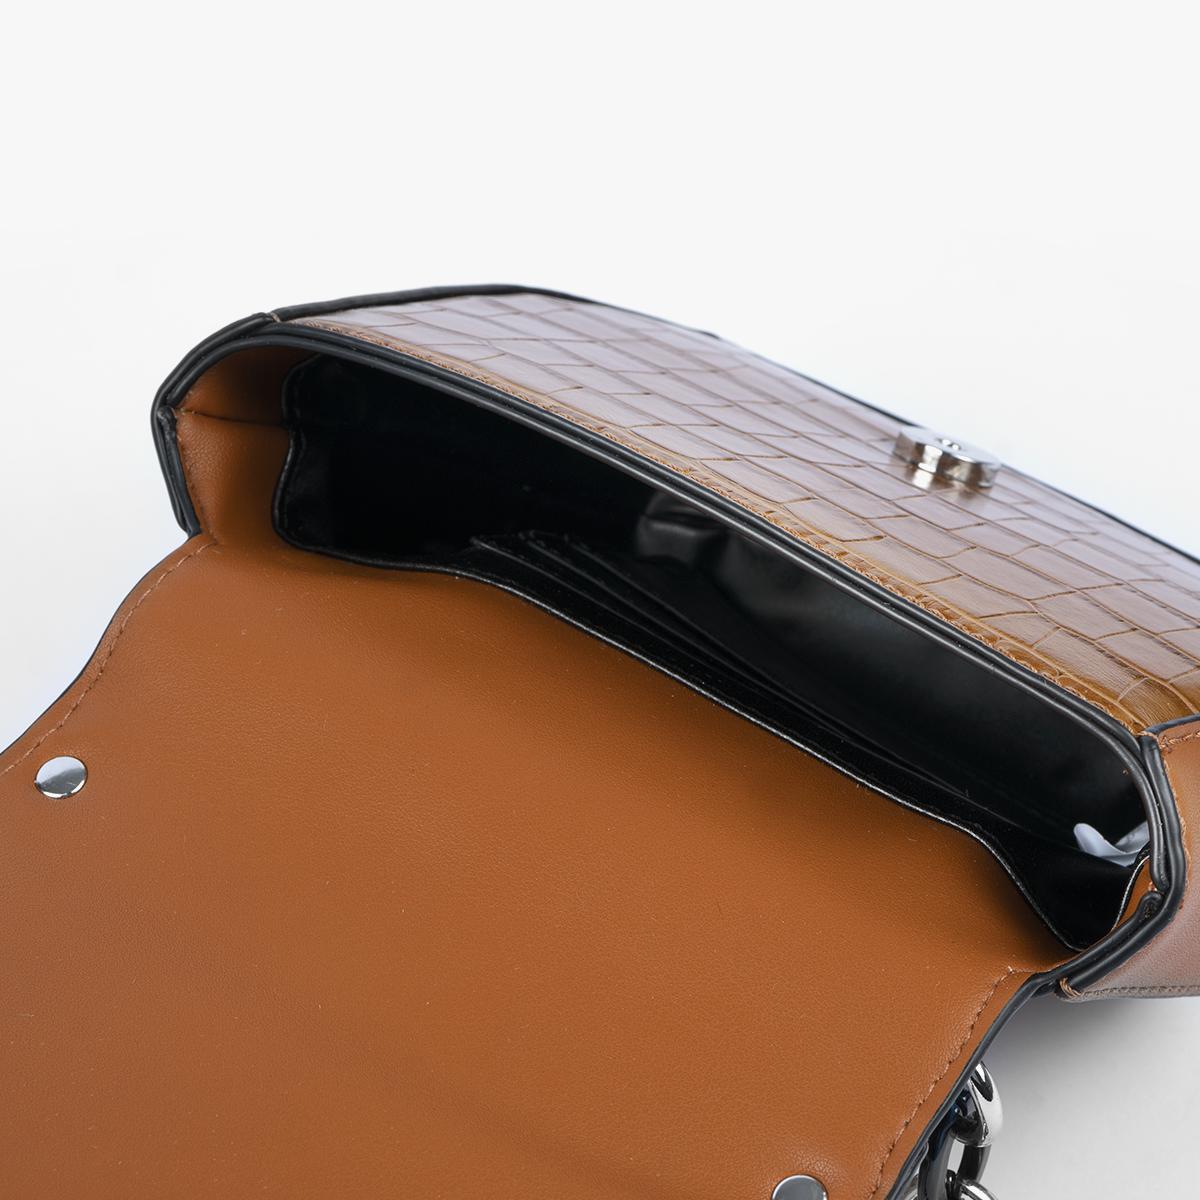 37112 omega cuero coco cuero interior